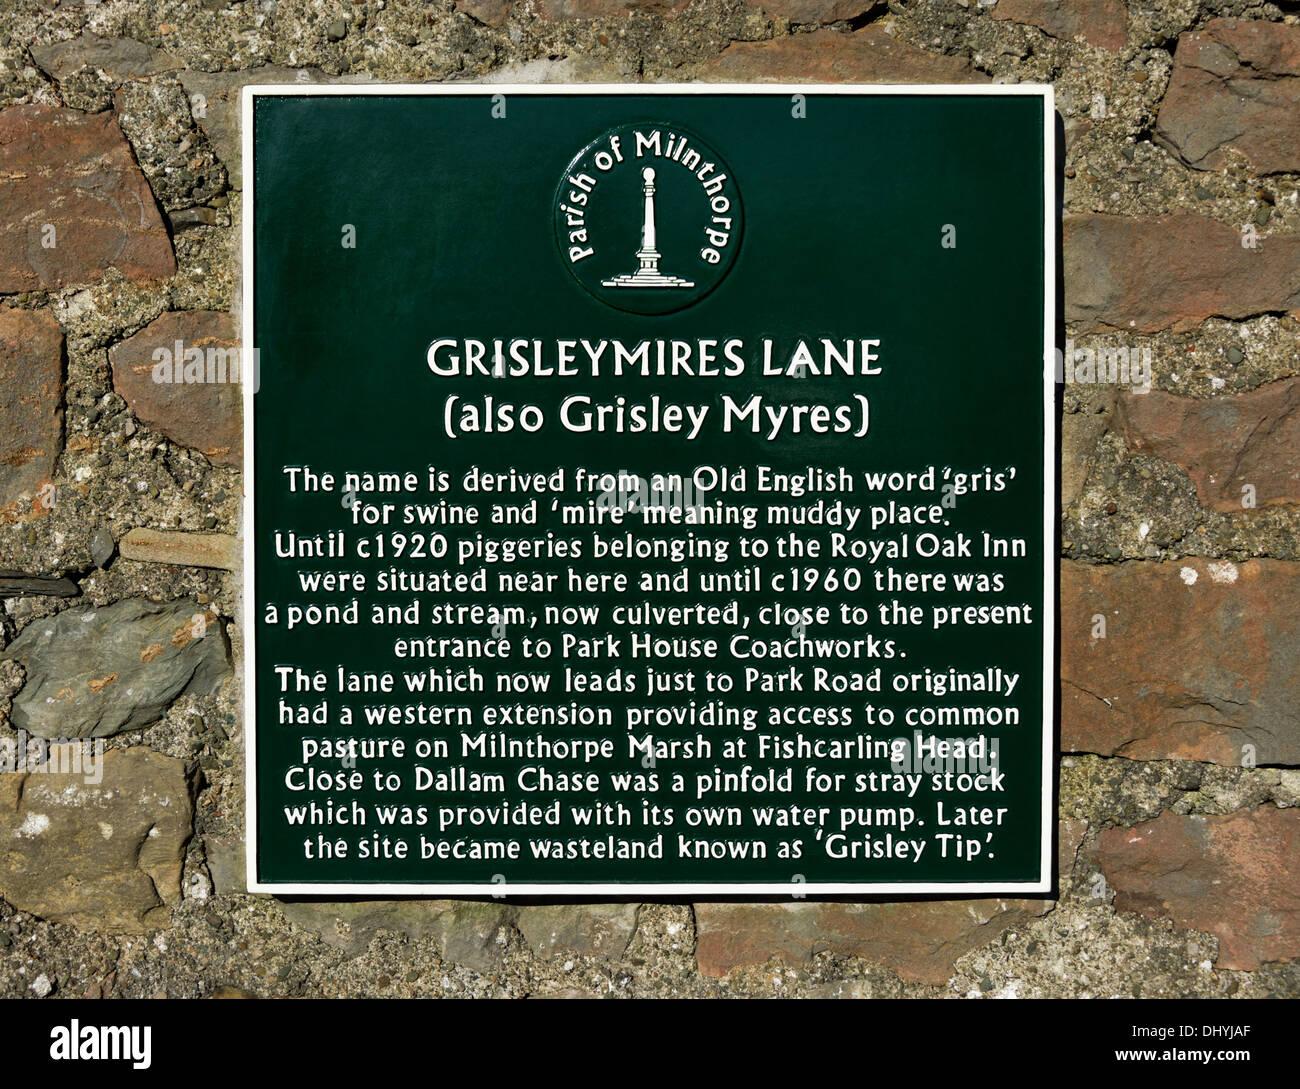 Descriptive plaque. Grisleymires Lane, Milnthorpe, Cumbria, England, United Kingdom, Europe. - Stock Image